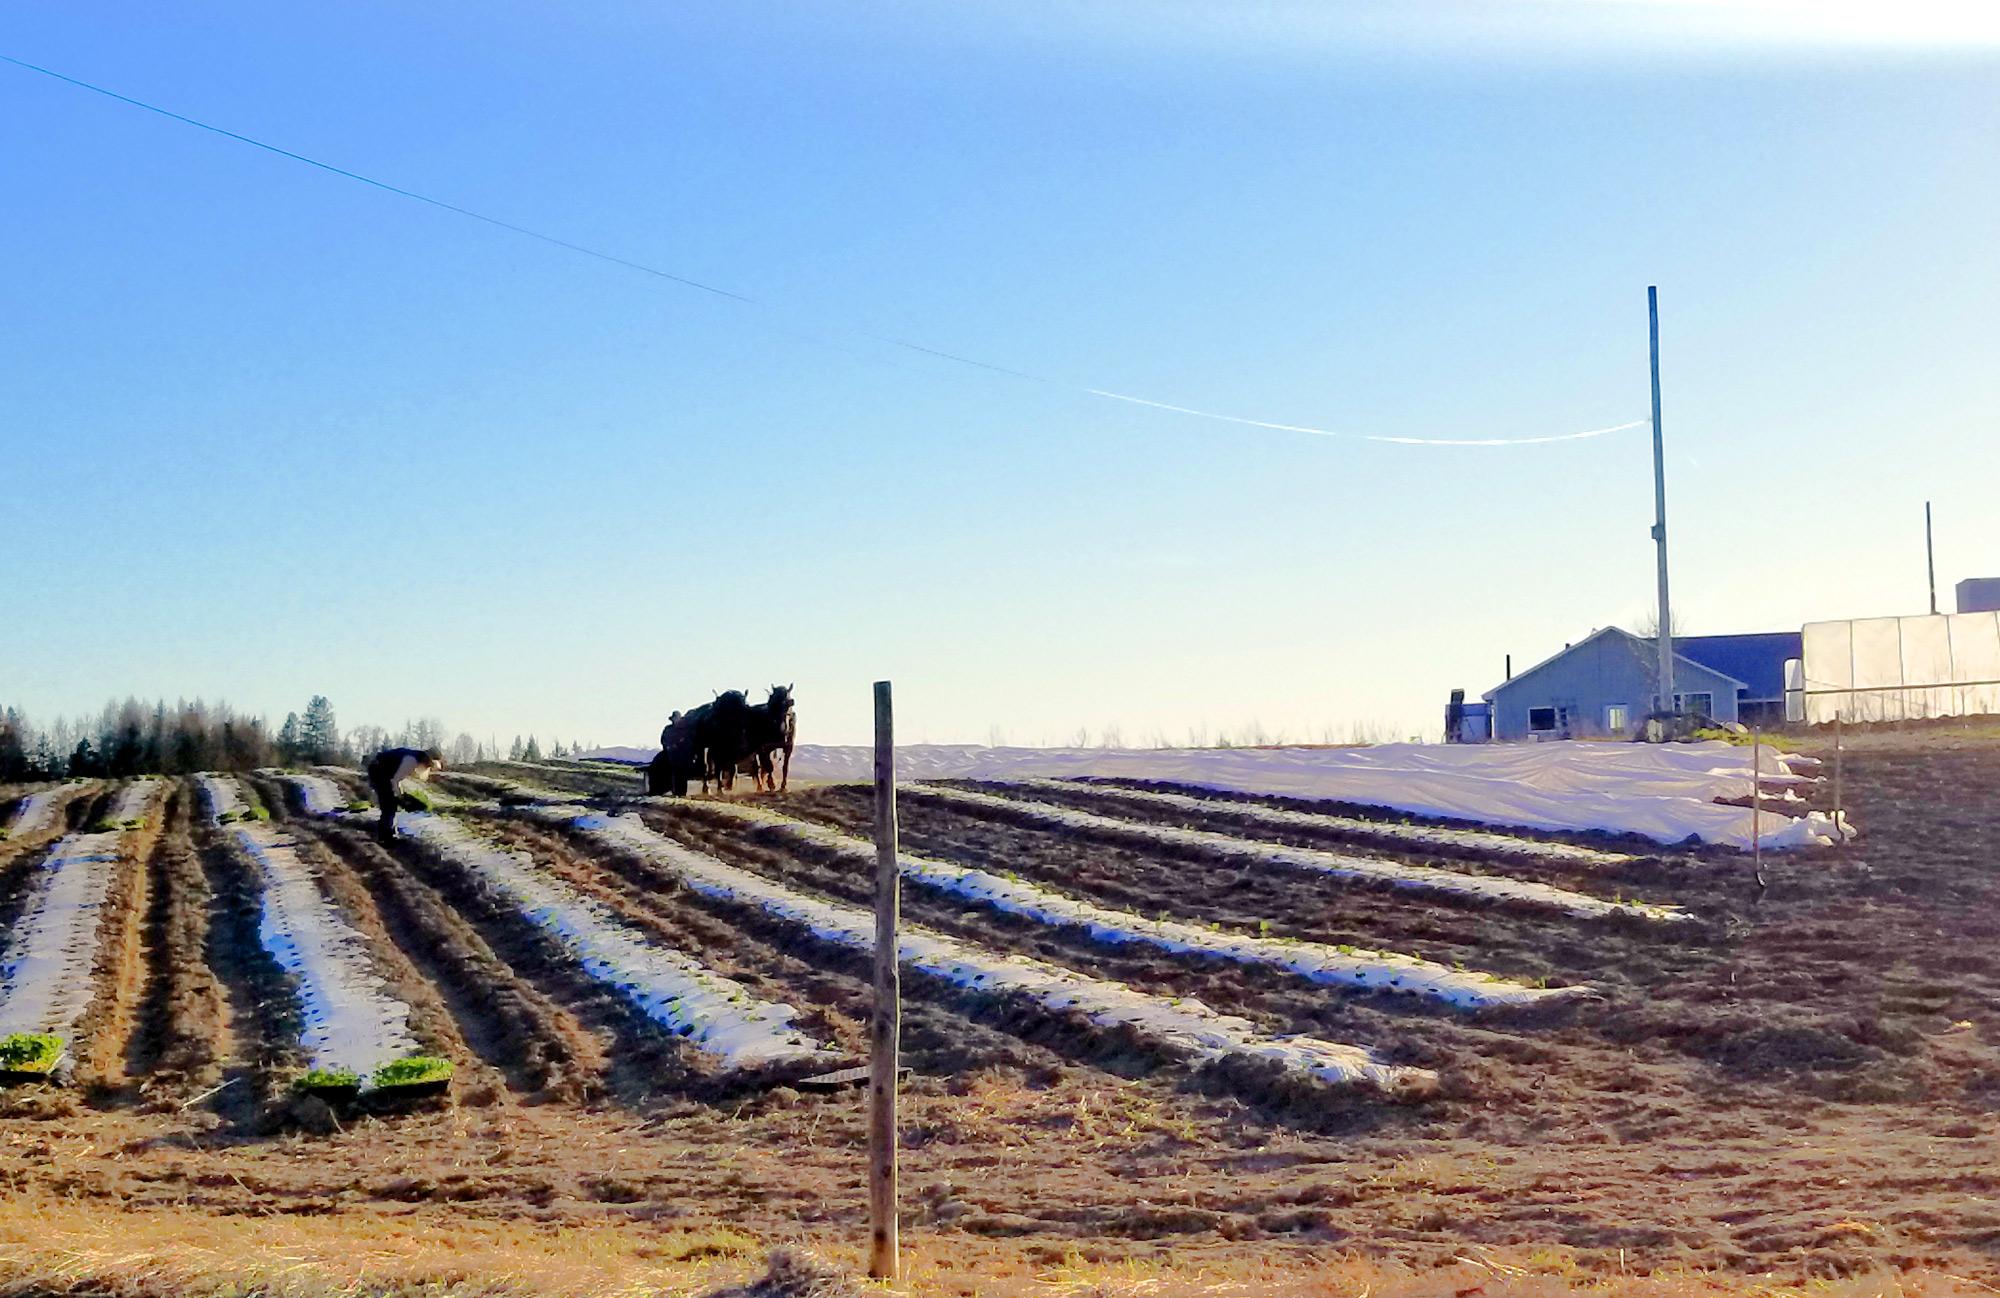 maine amish farm field